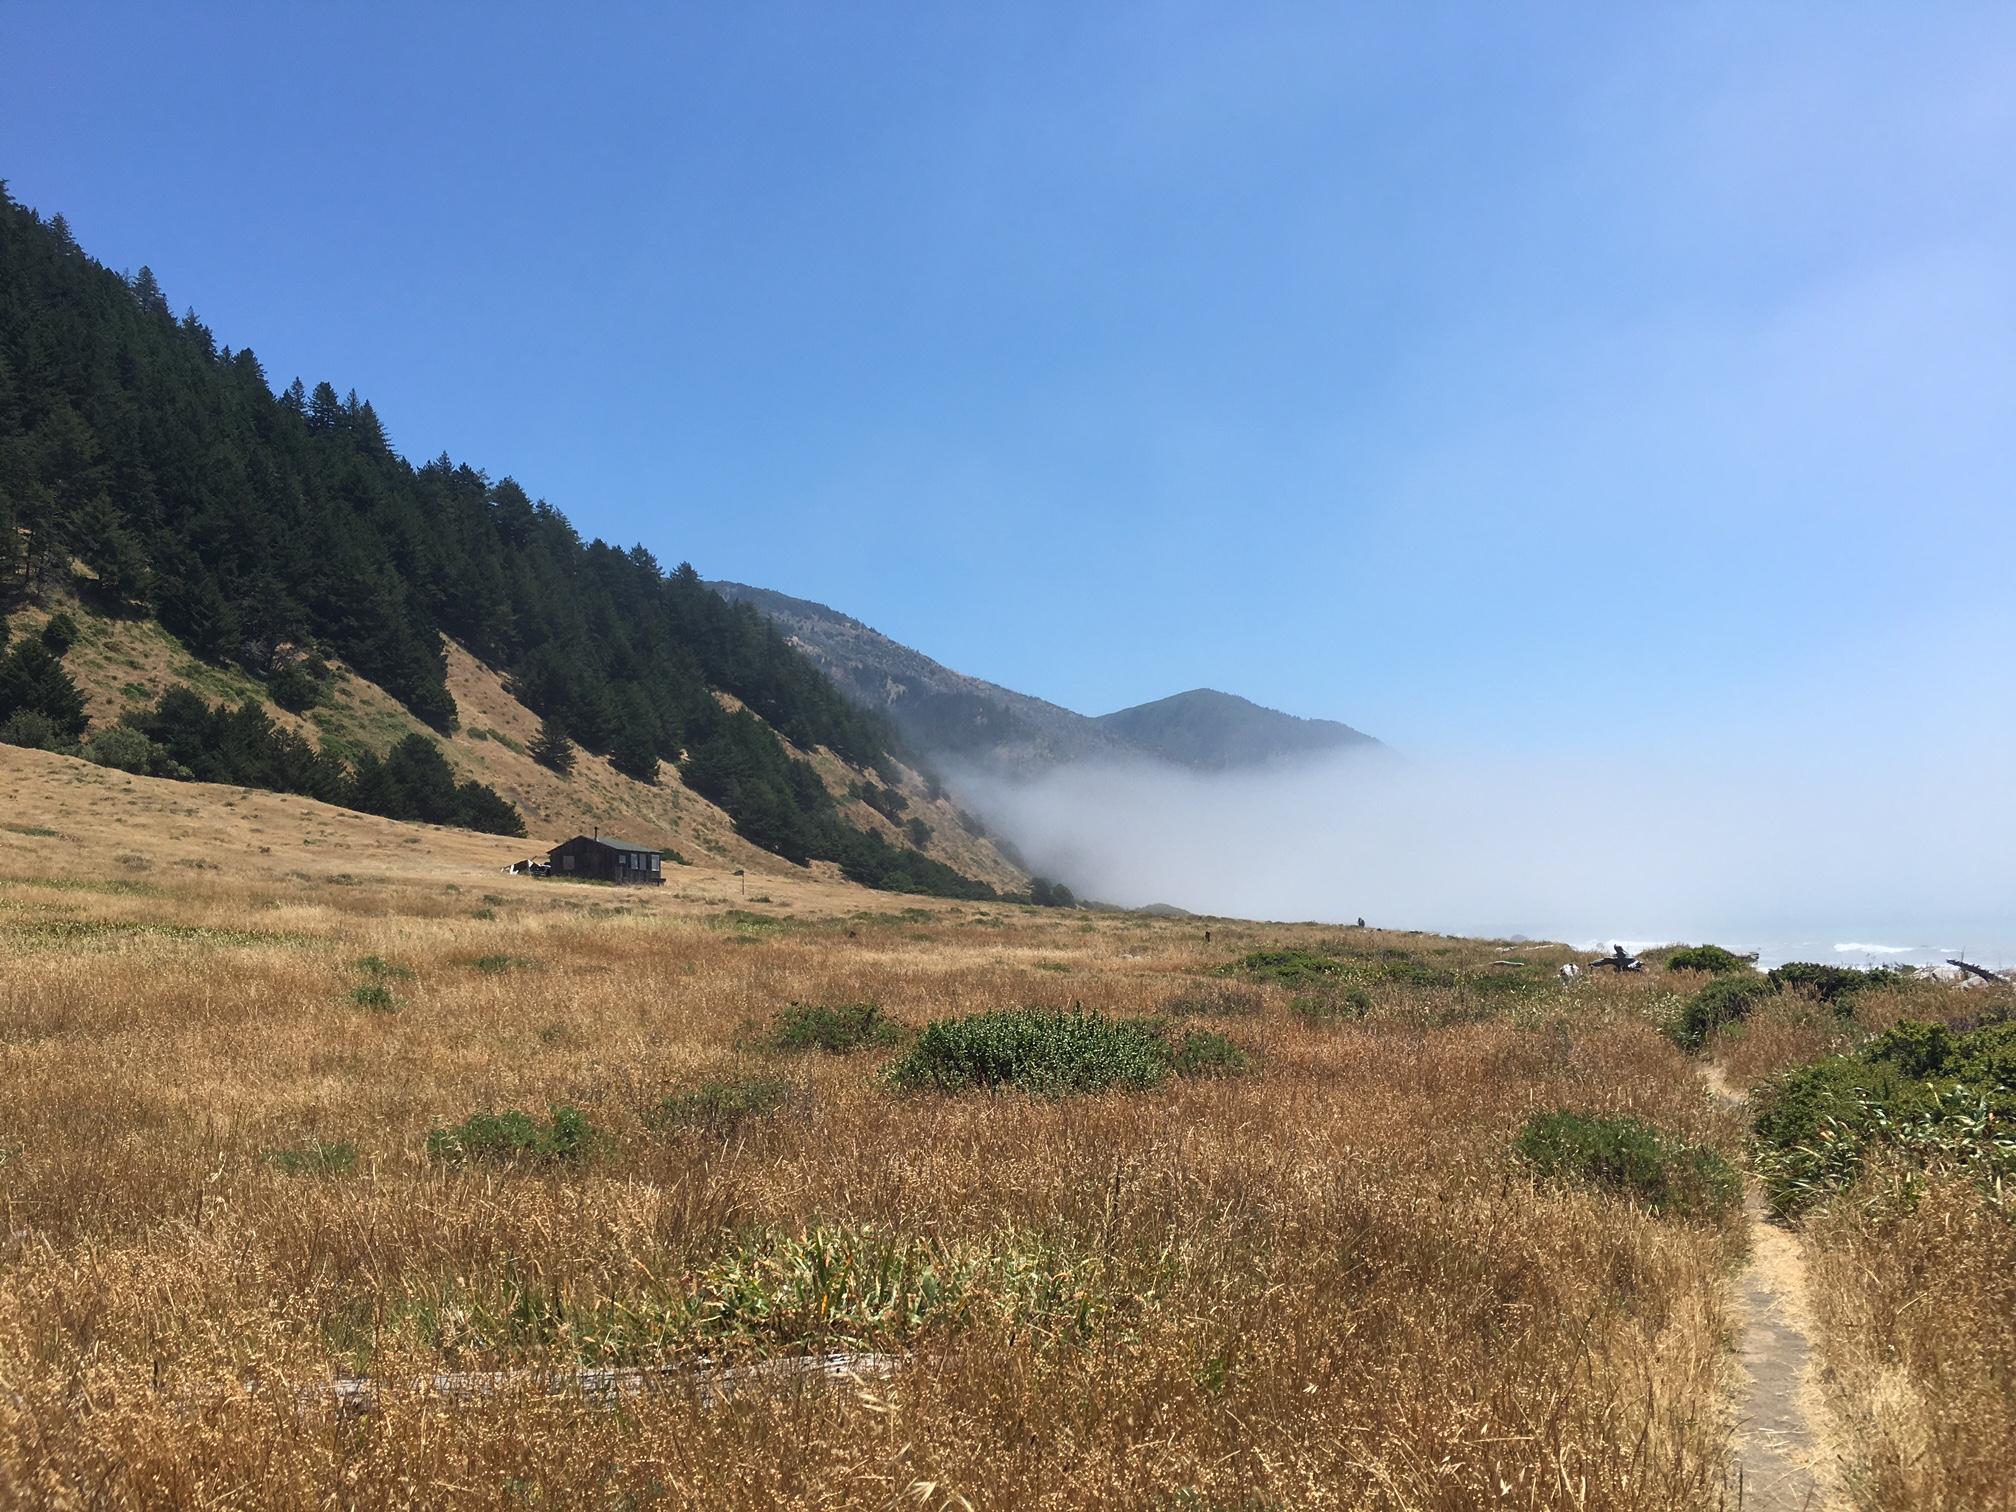 Sunny expanses leading into foggy respites.